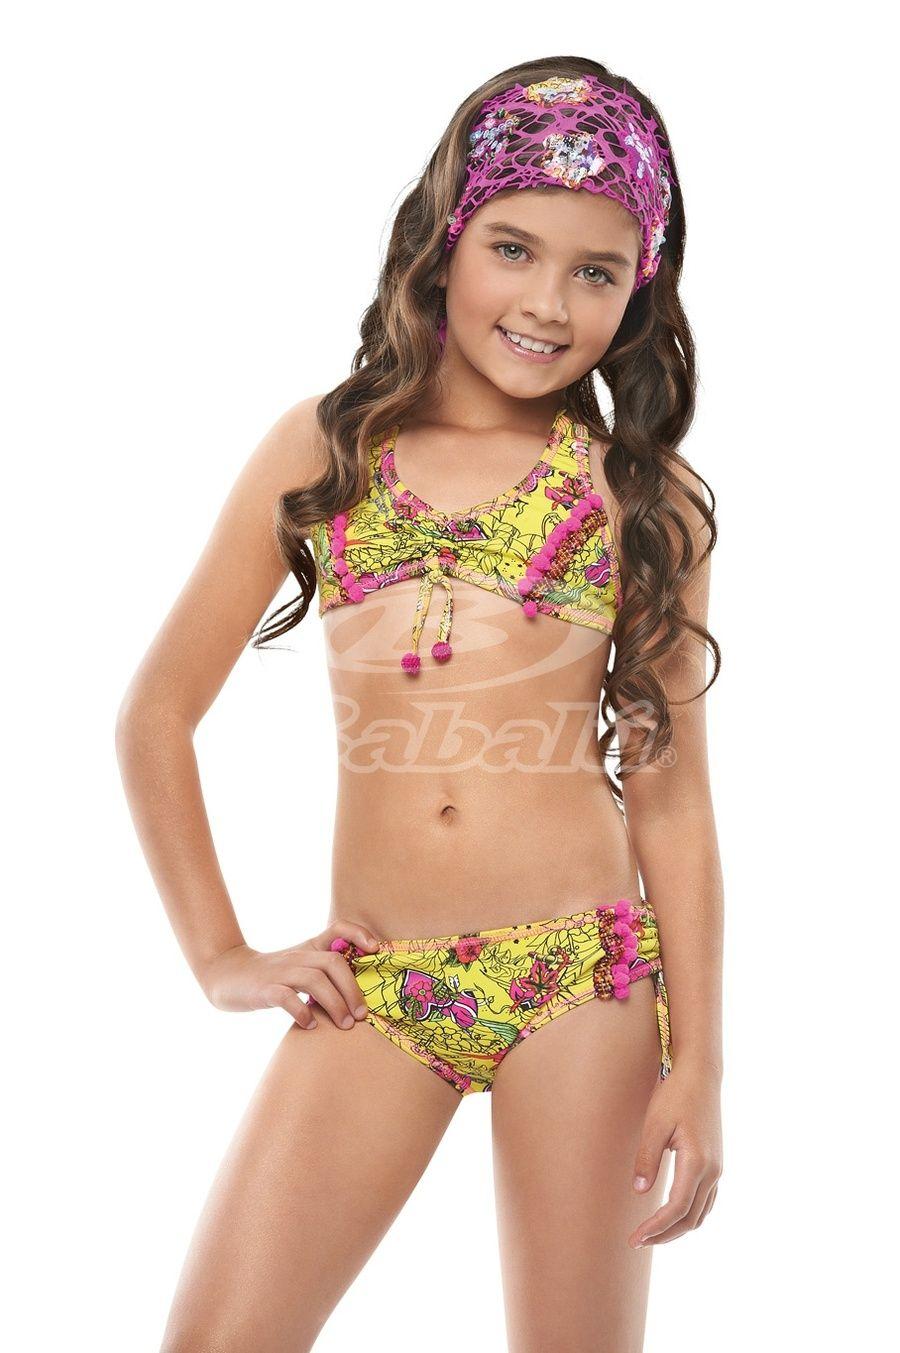 Foto bikini caseras